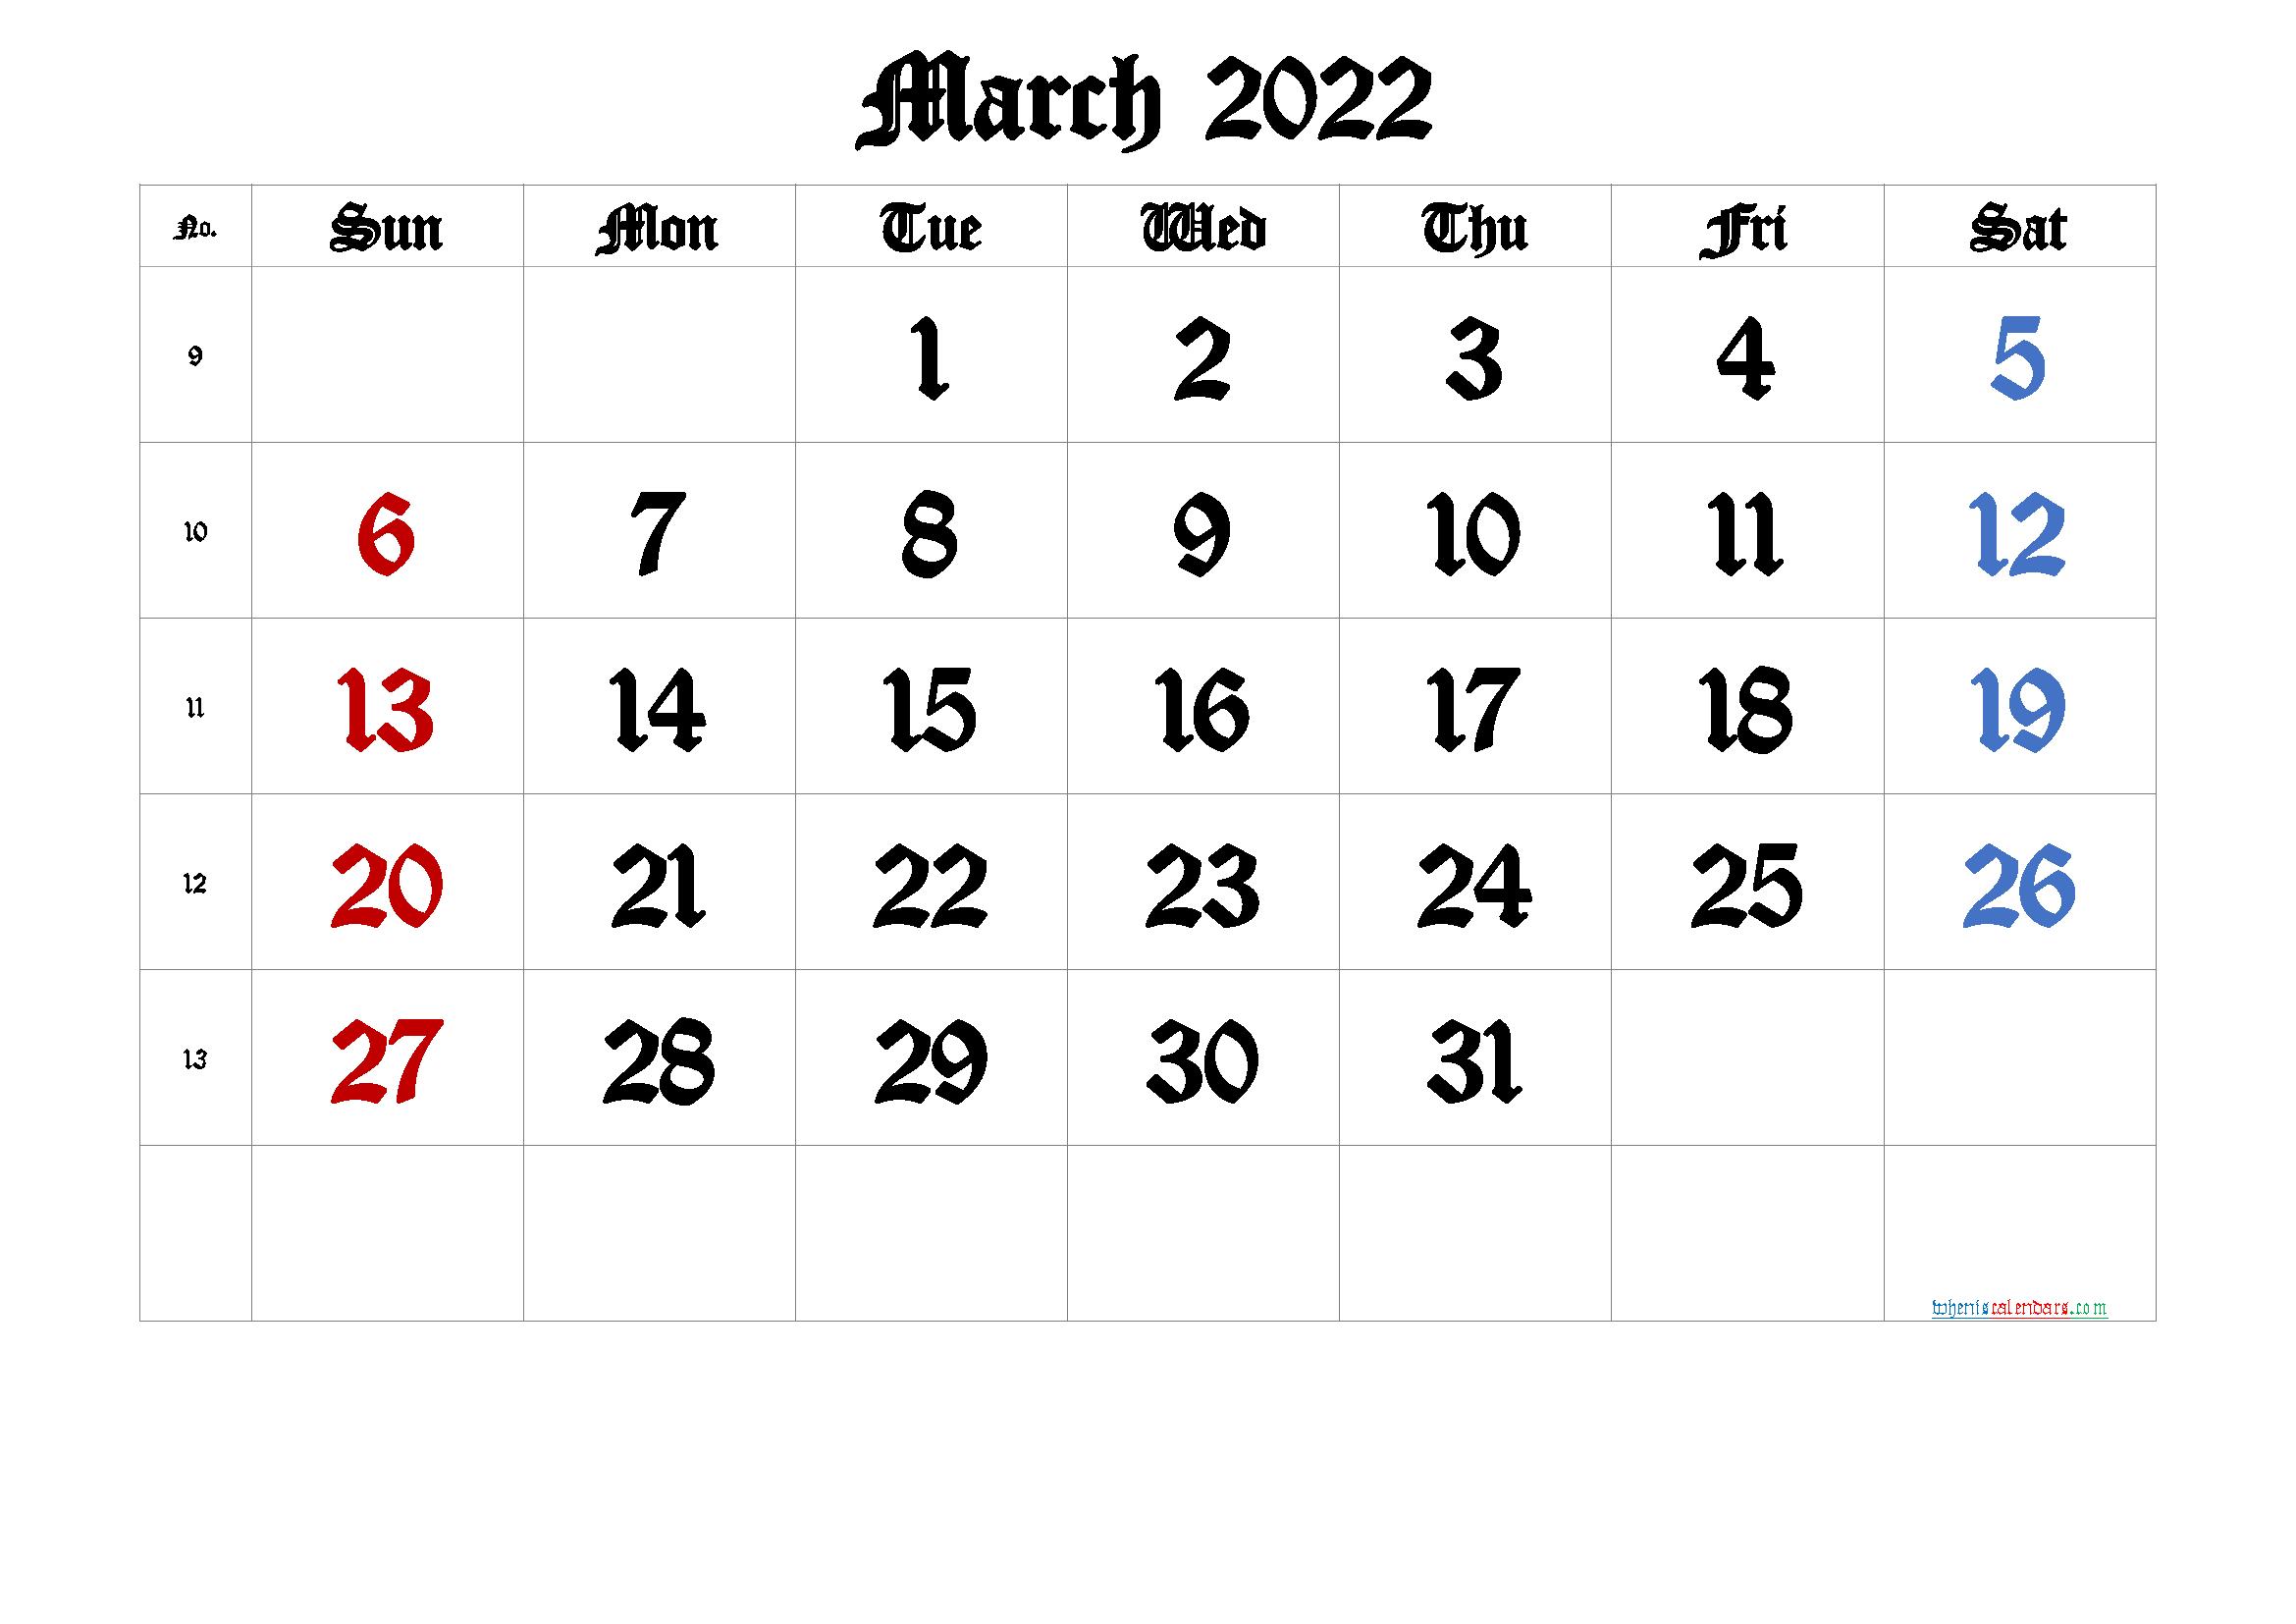 March 2022 Printable Calendar with Week Numbers